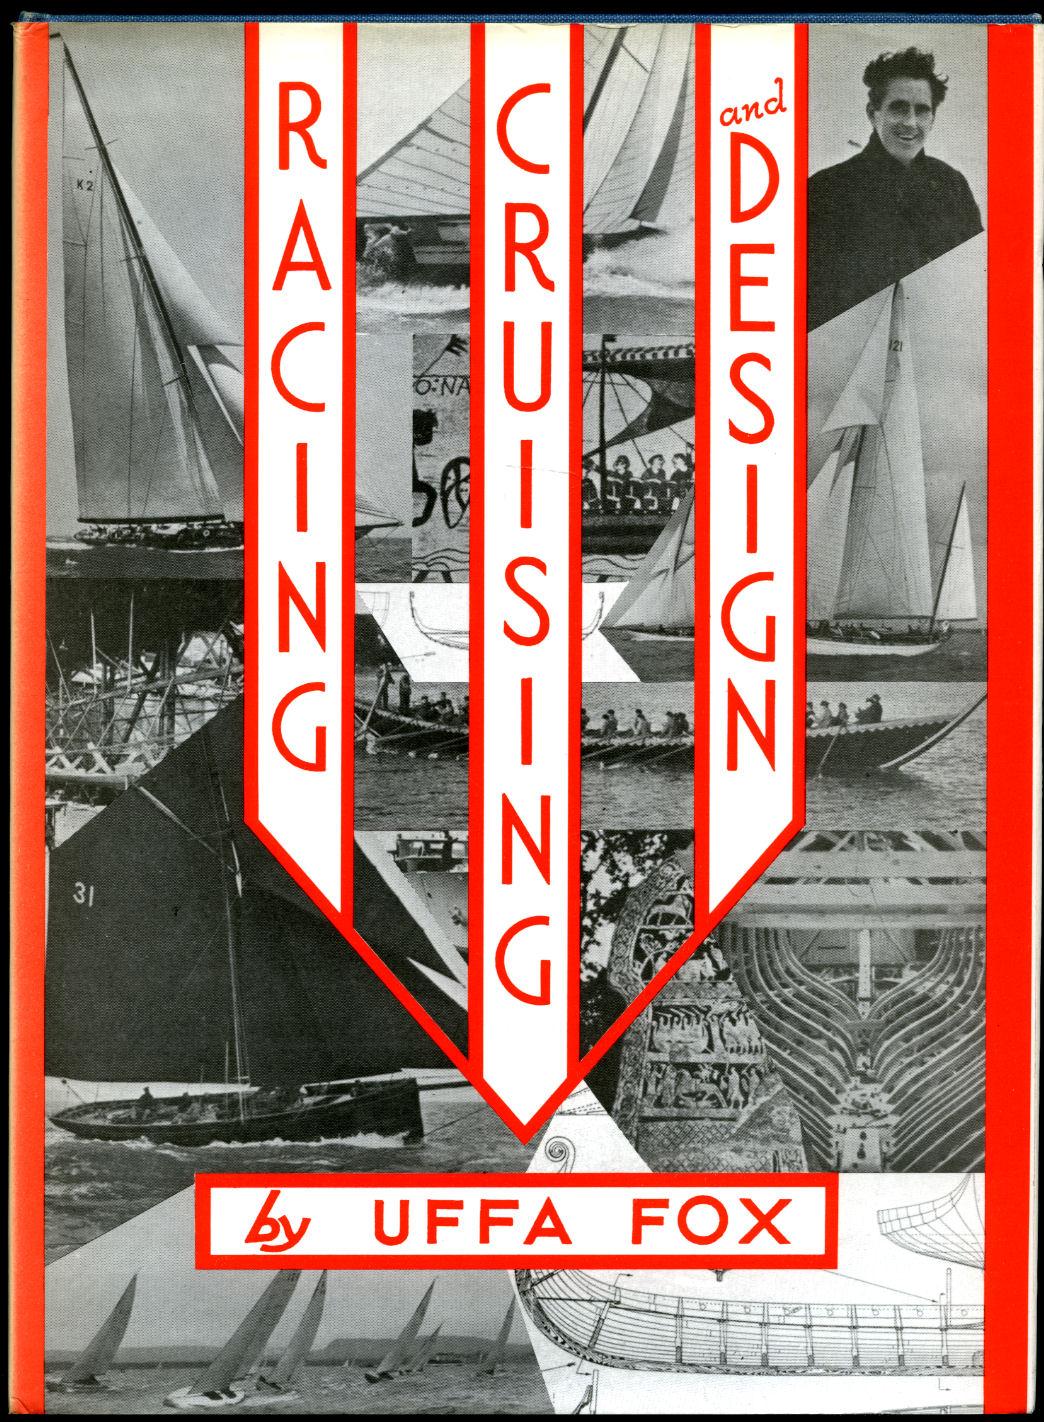 FOX, UFFA [UFFA FOX, CBE (15 JANUARY 1898 - 26 OCTOBER 1972) WAS AN ENGLISH BOAT DESIGNER AND SAILING ENTHUSIAST]. - Racing, Cruising and Design